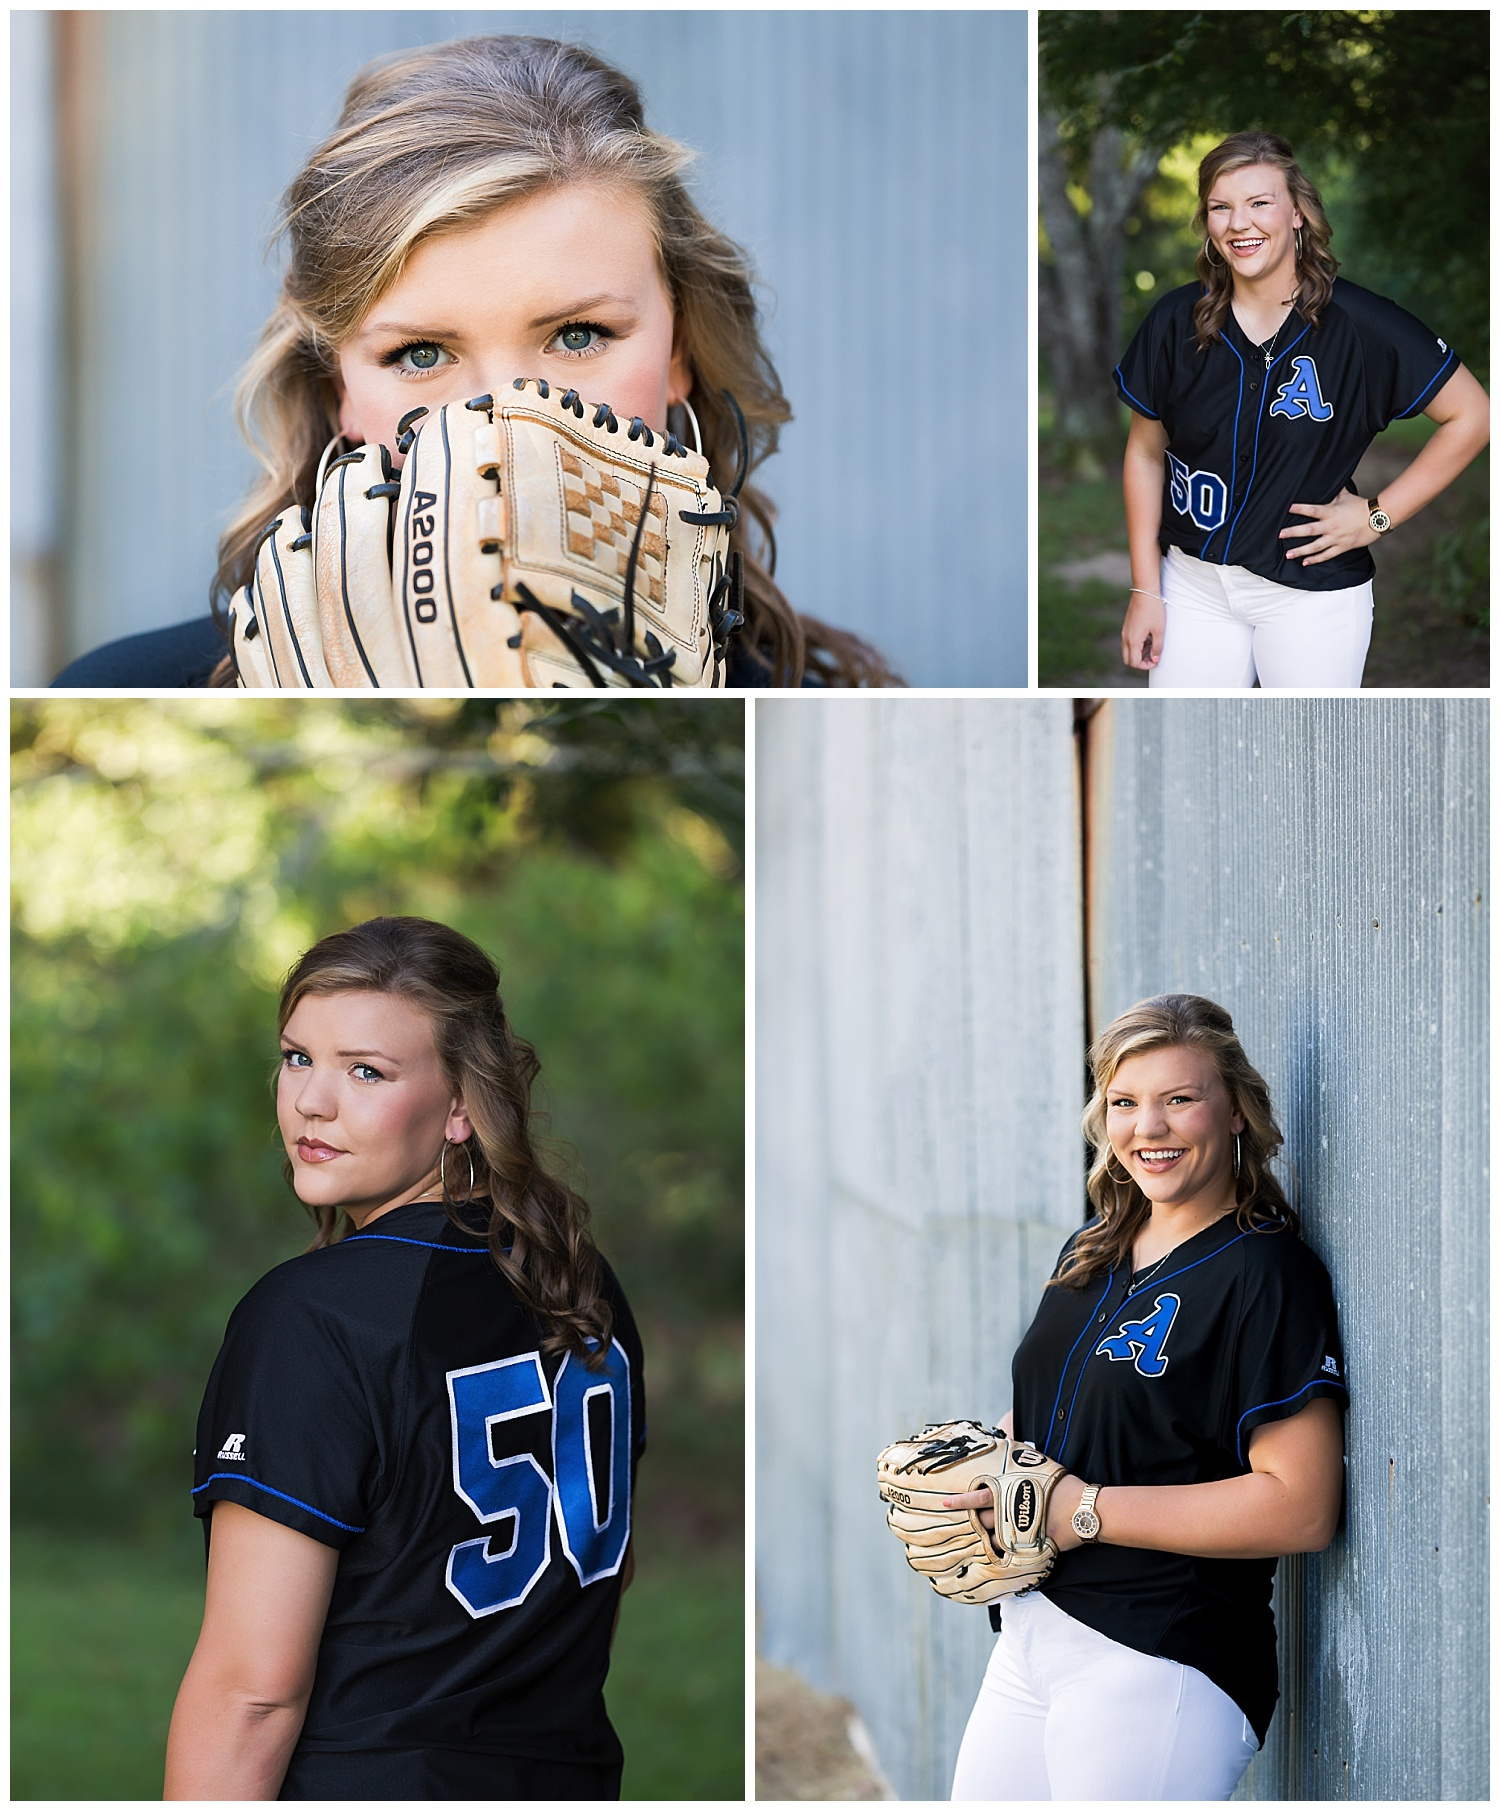 auburn high school softball lauren beesley photography senior portraits